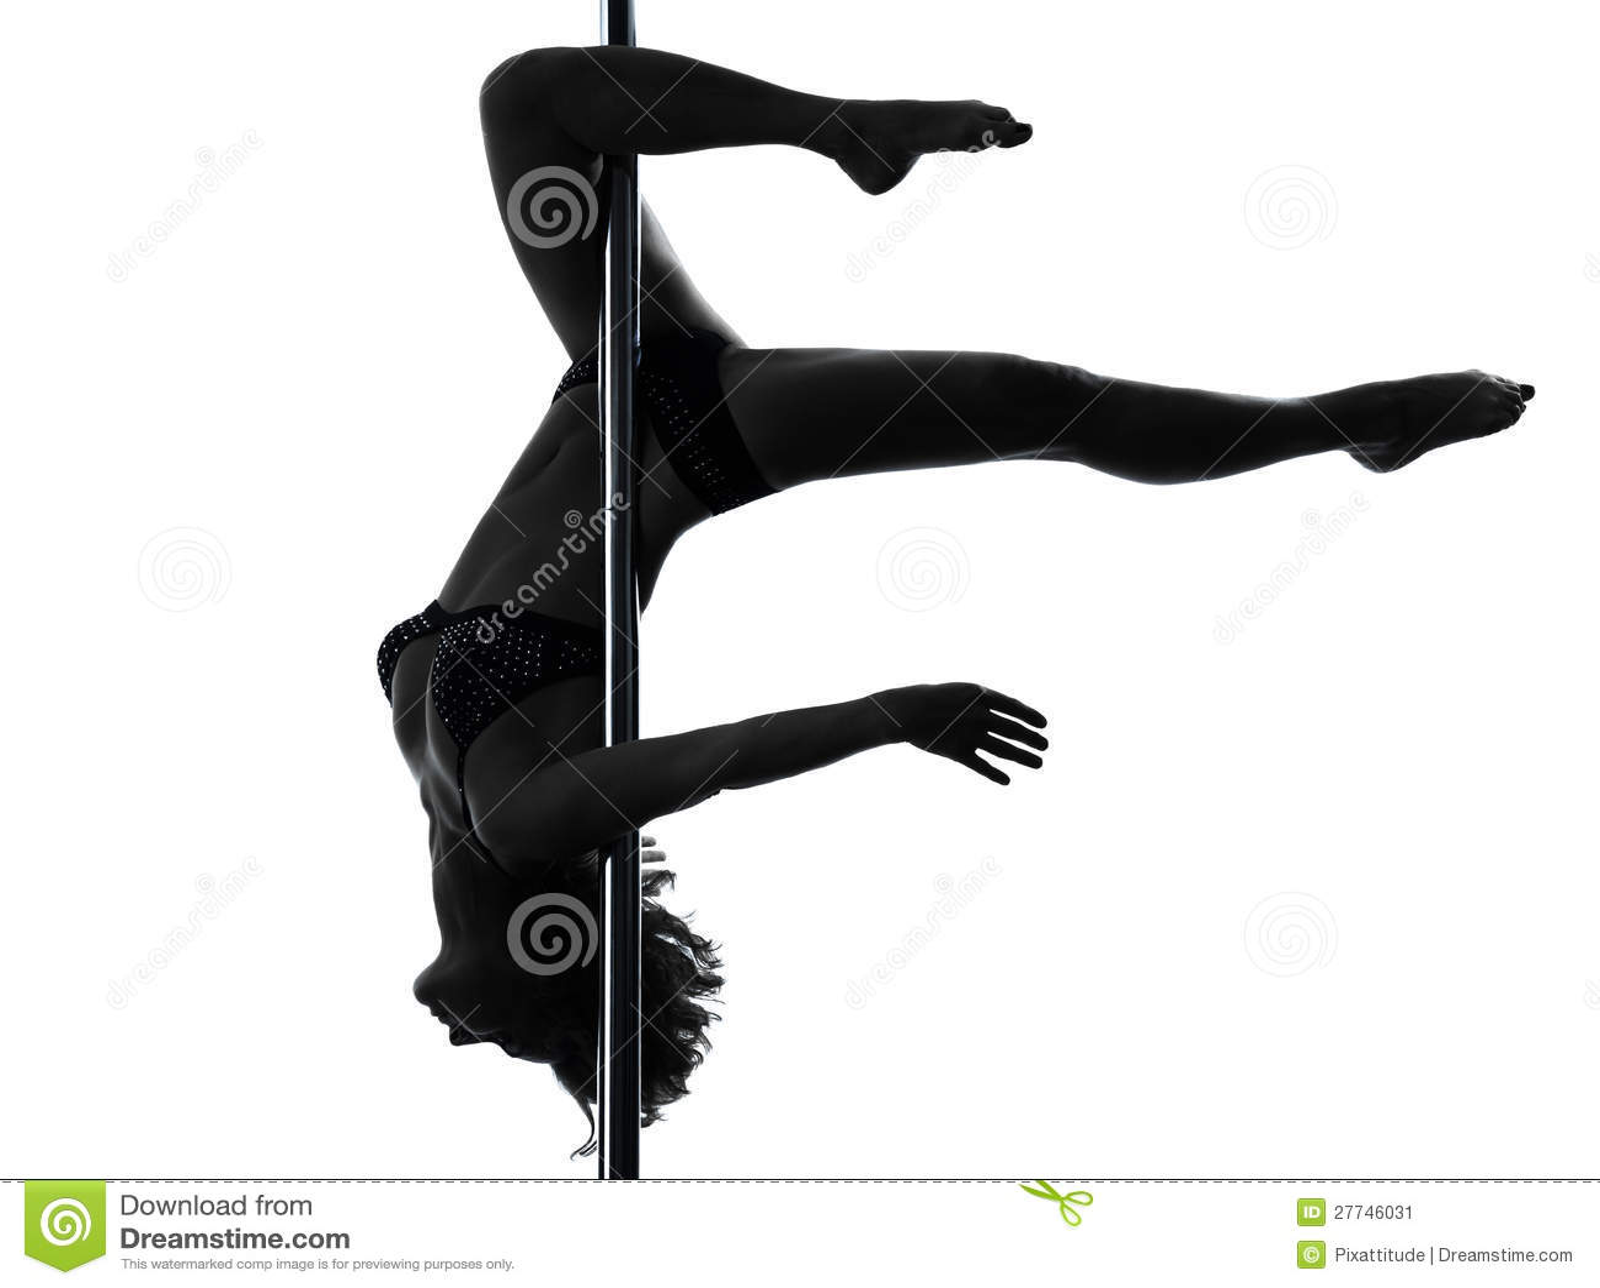 Woman Pole Dancer Scorpion Posture Silhouette Stock Image ...